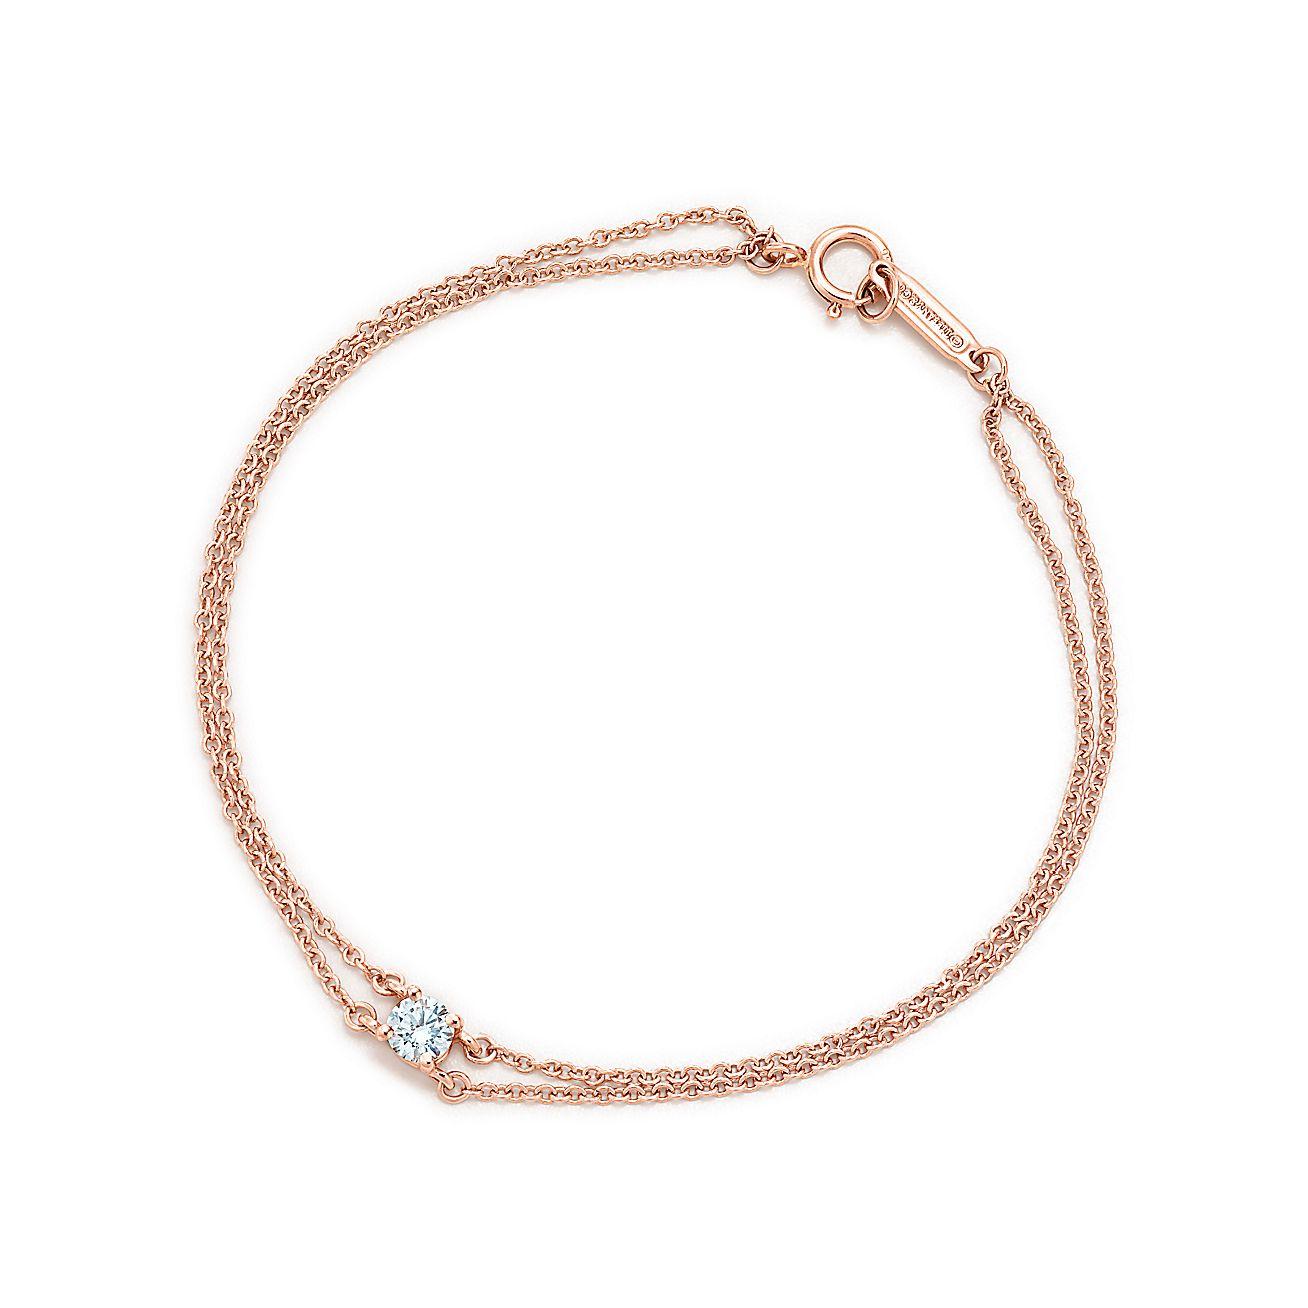 tiffany solitaire diamond bracelet in 18k rose gold. Black Bedroom Furniture Sets. Home Design Ideas